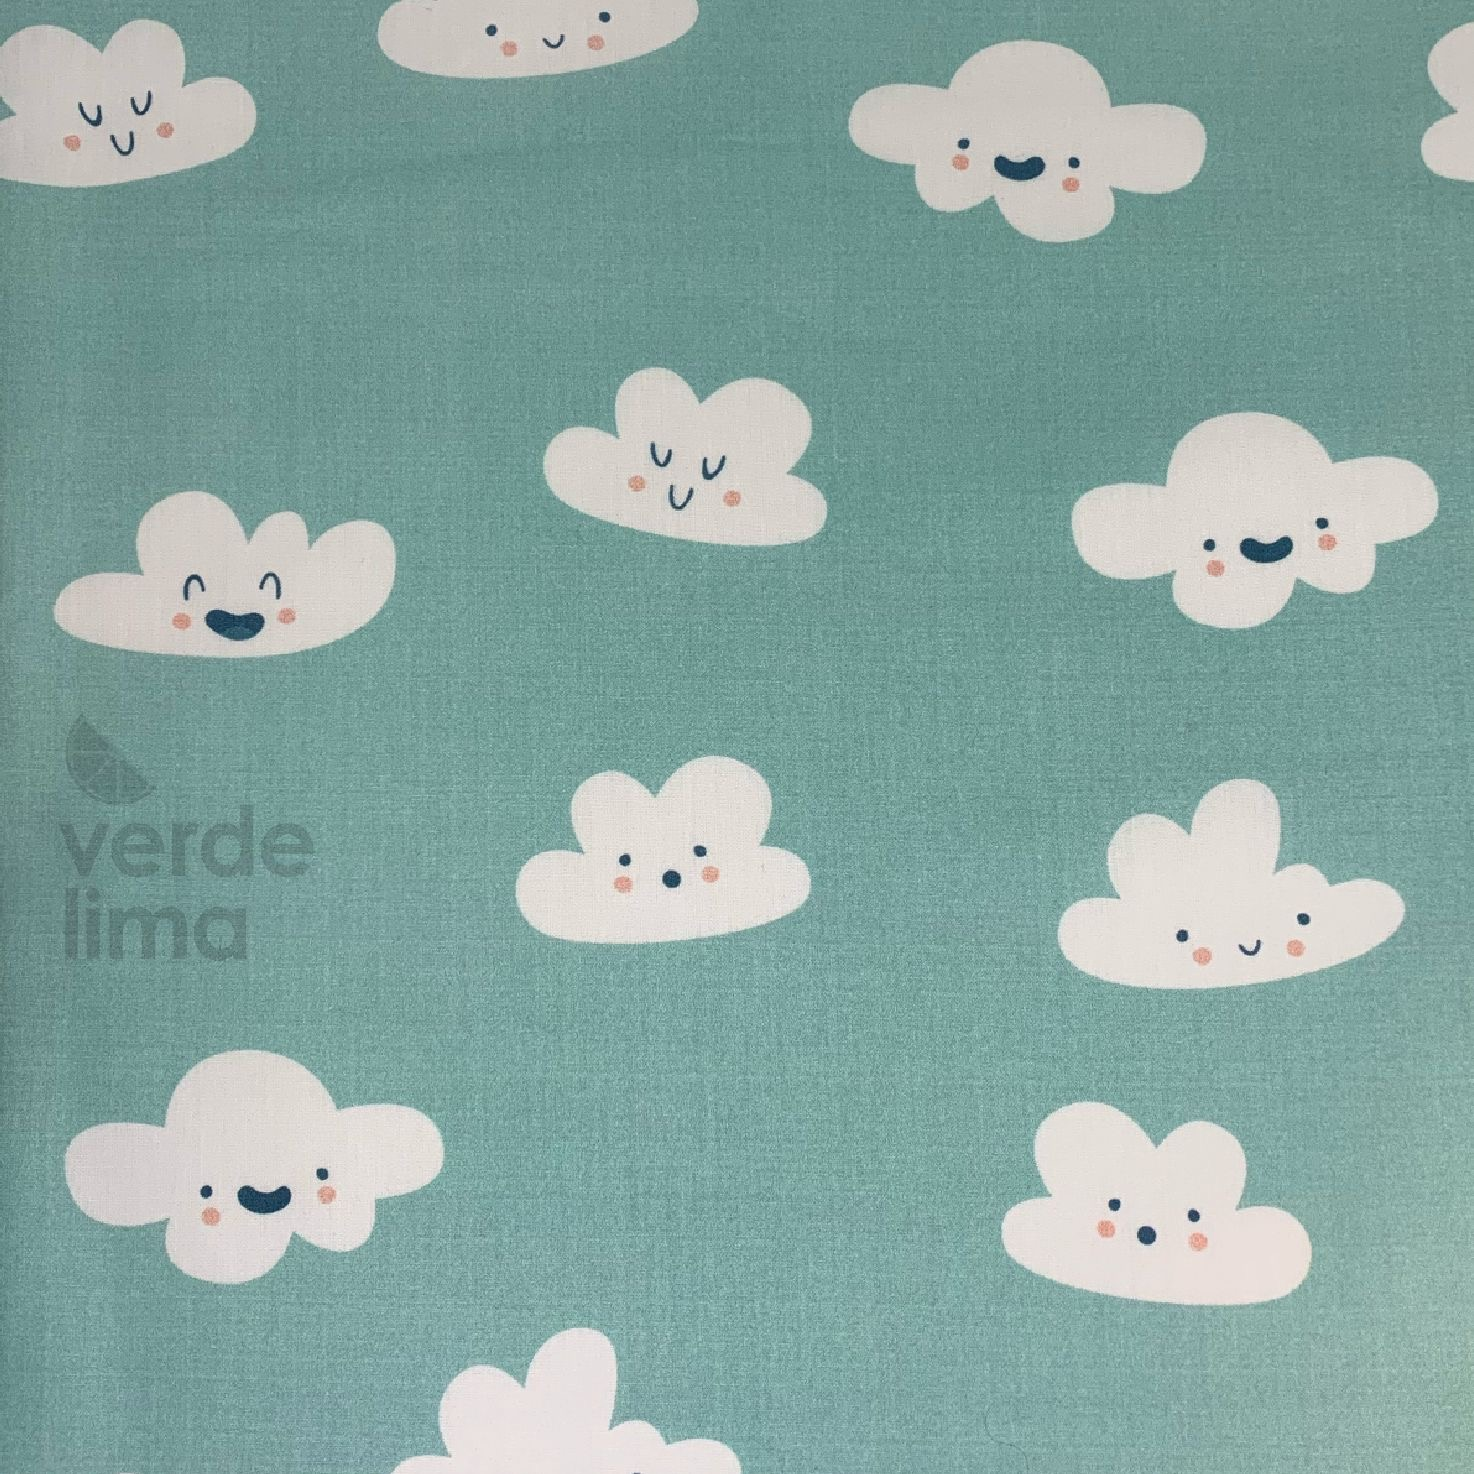 Cloud - Nuvens menta